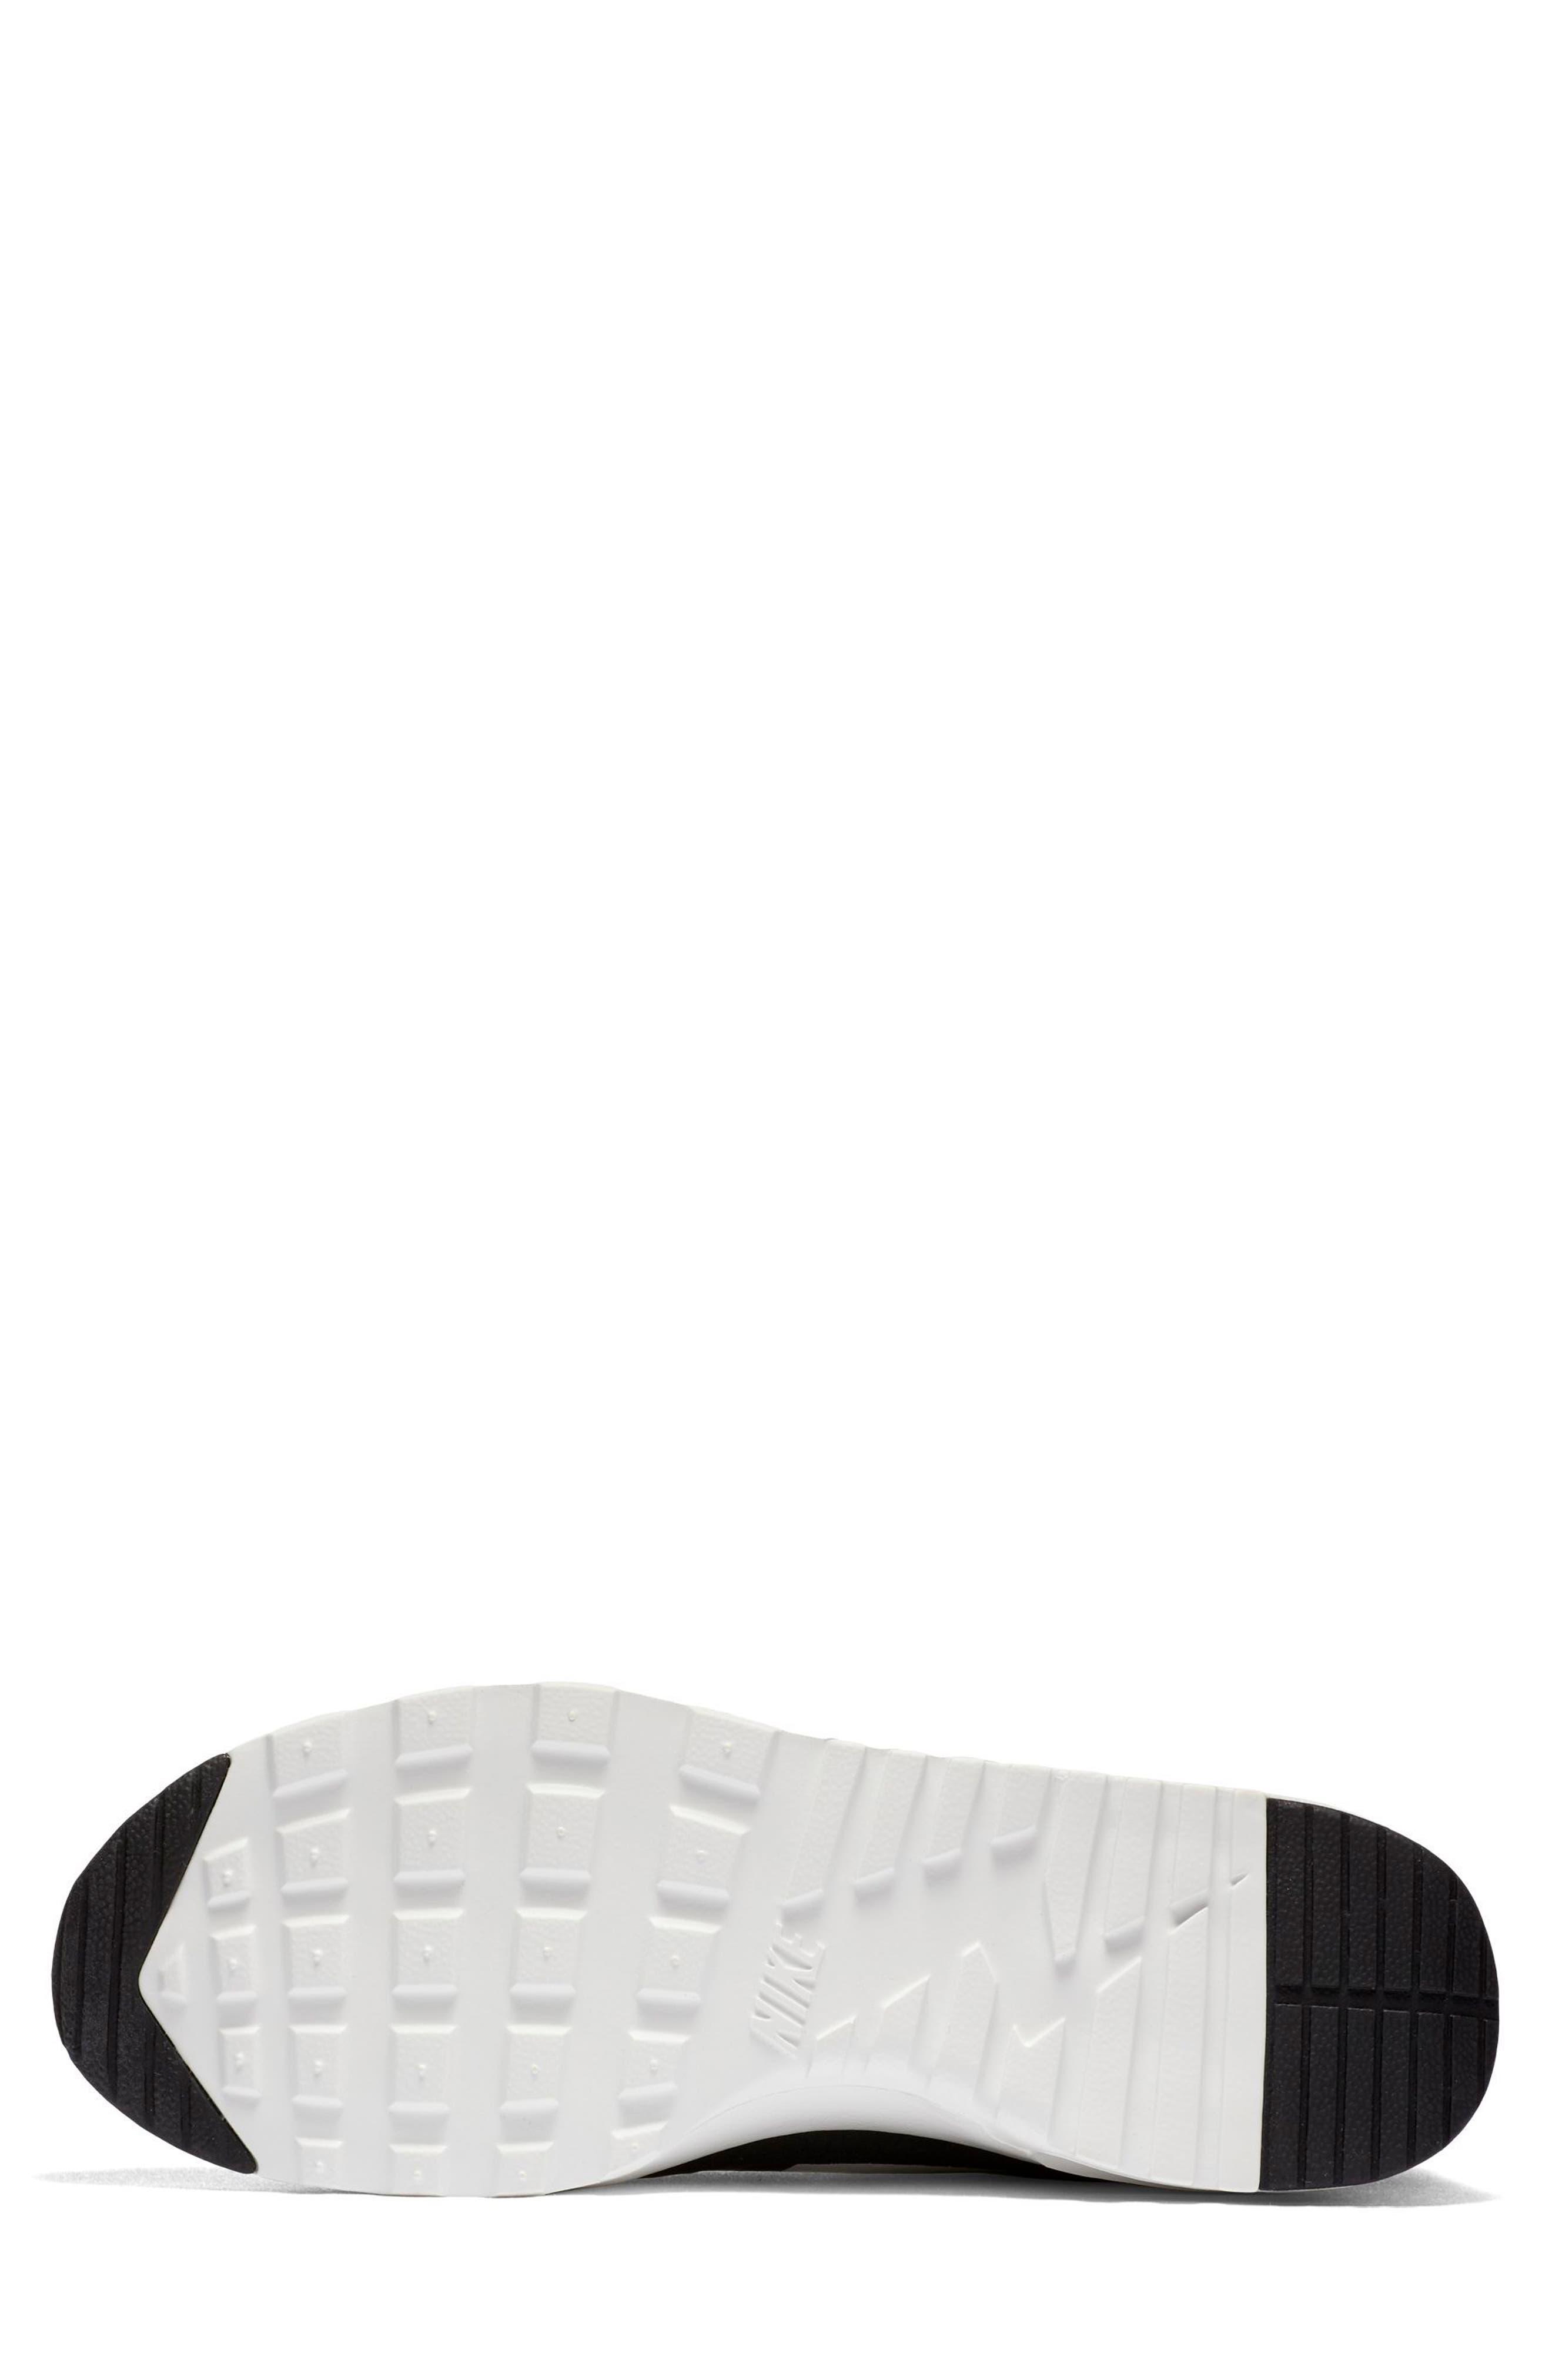 Air Max Thea Sneaker,                             Alternate thumbnail 5, color,                             020